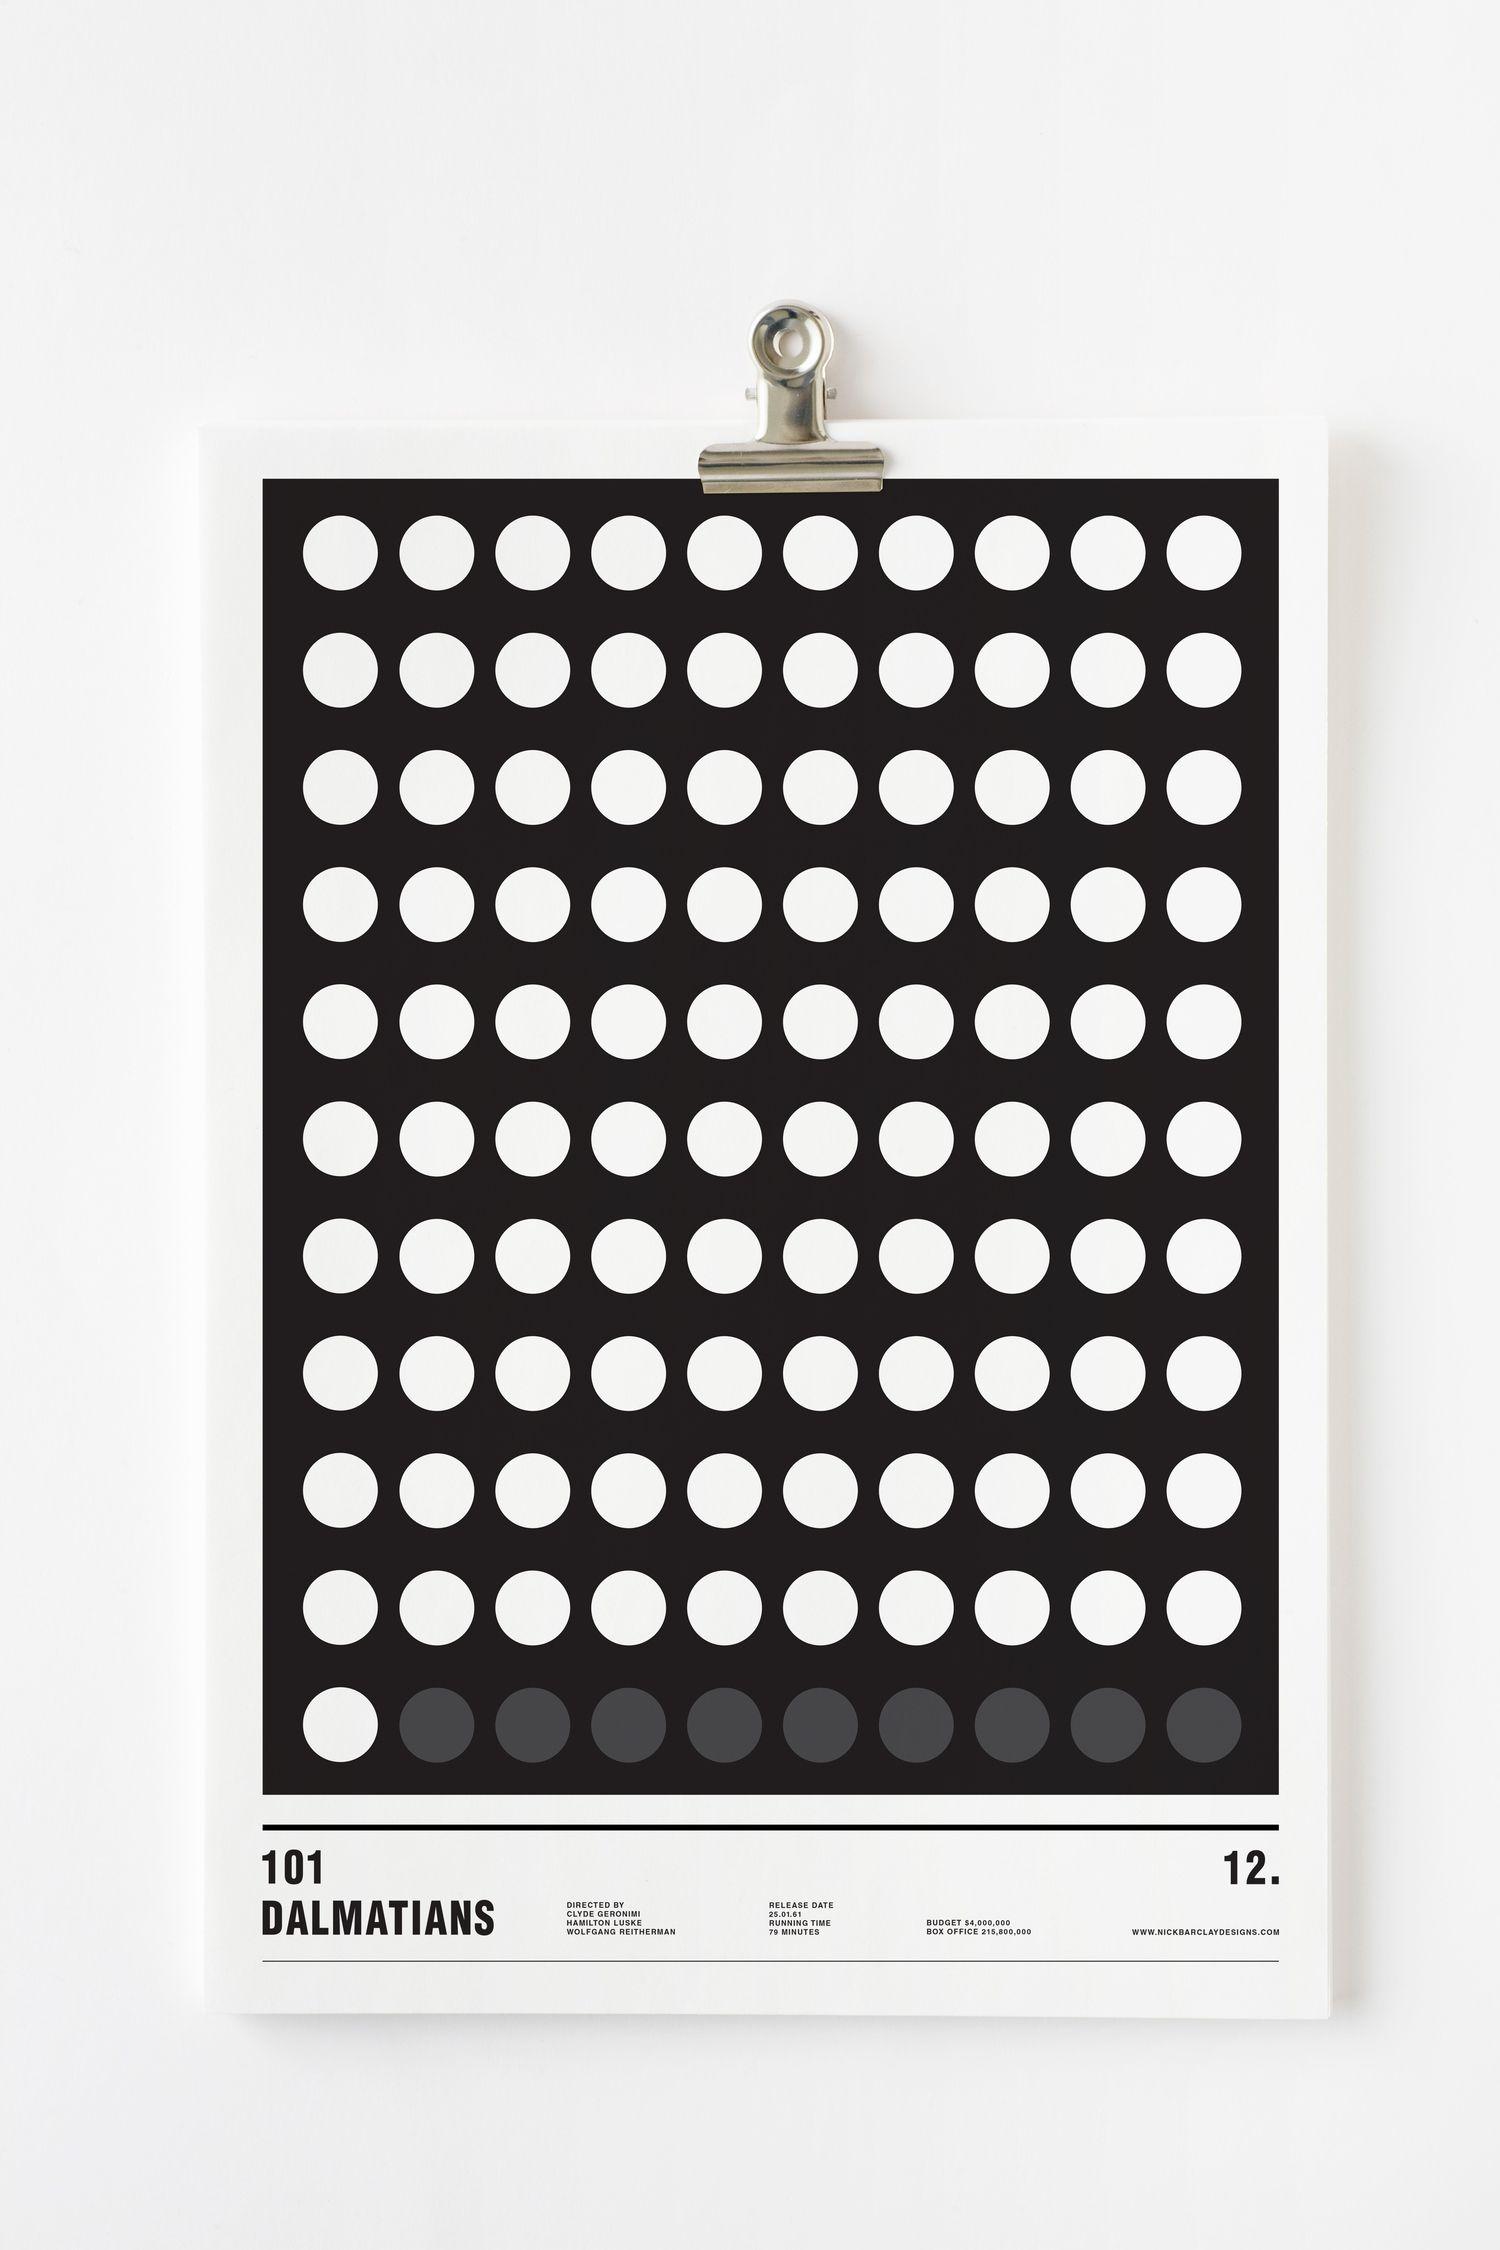 101 dalmatas minimalism